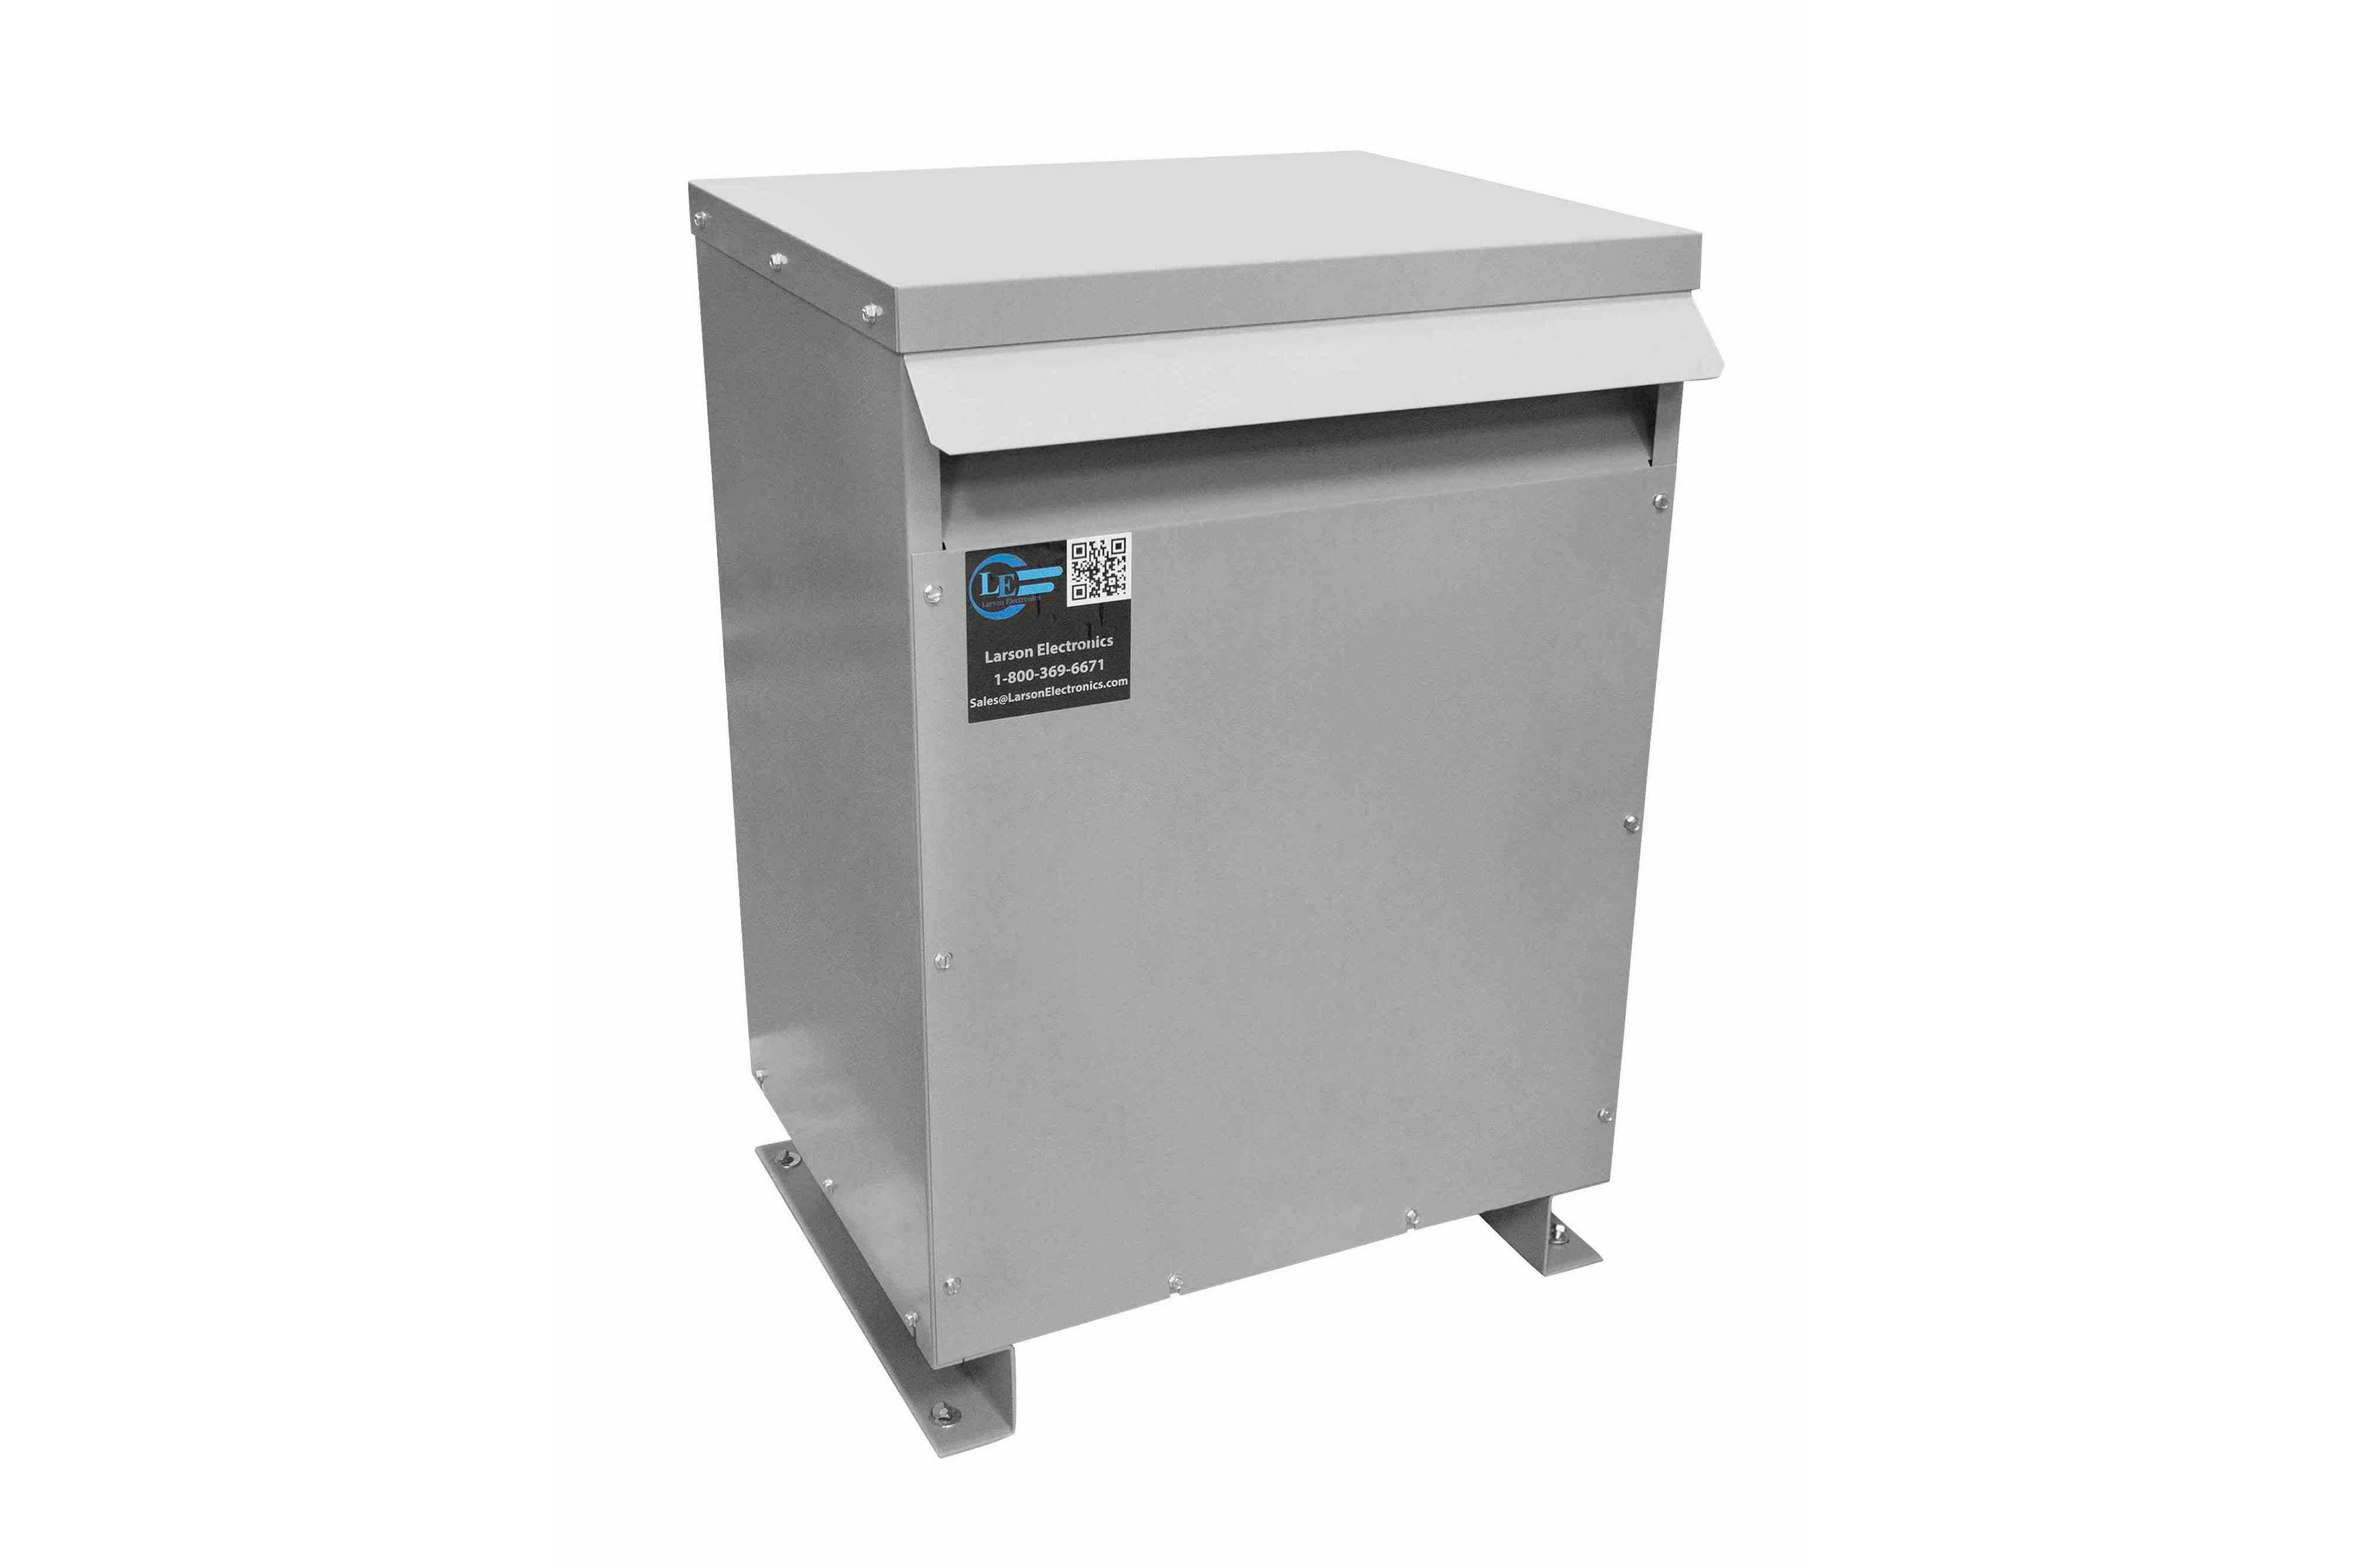 1000 kVA 3PH Isolation Transformer, 380V Wye Primary, 480Y/277 Wye-N Secondary, N3R, Ventilated, 60 Hz